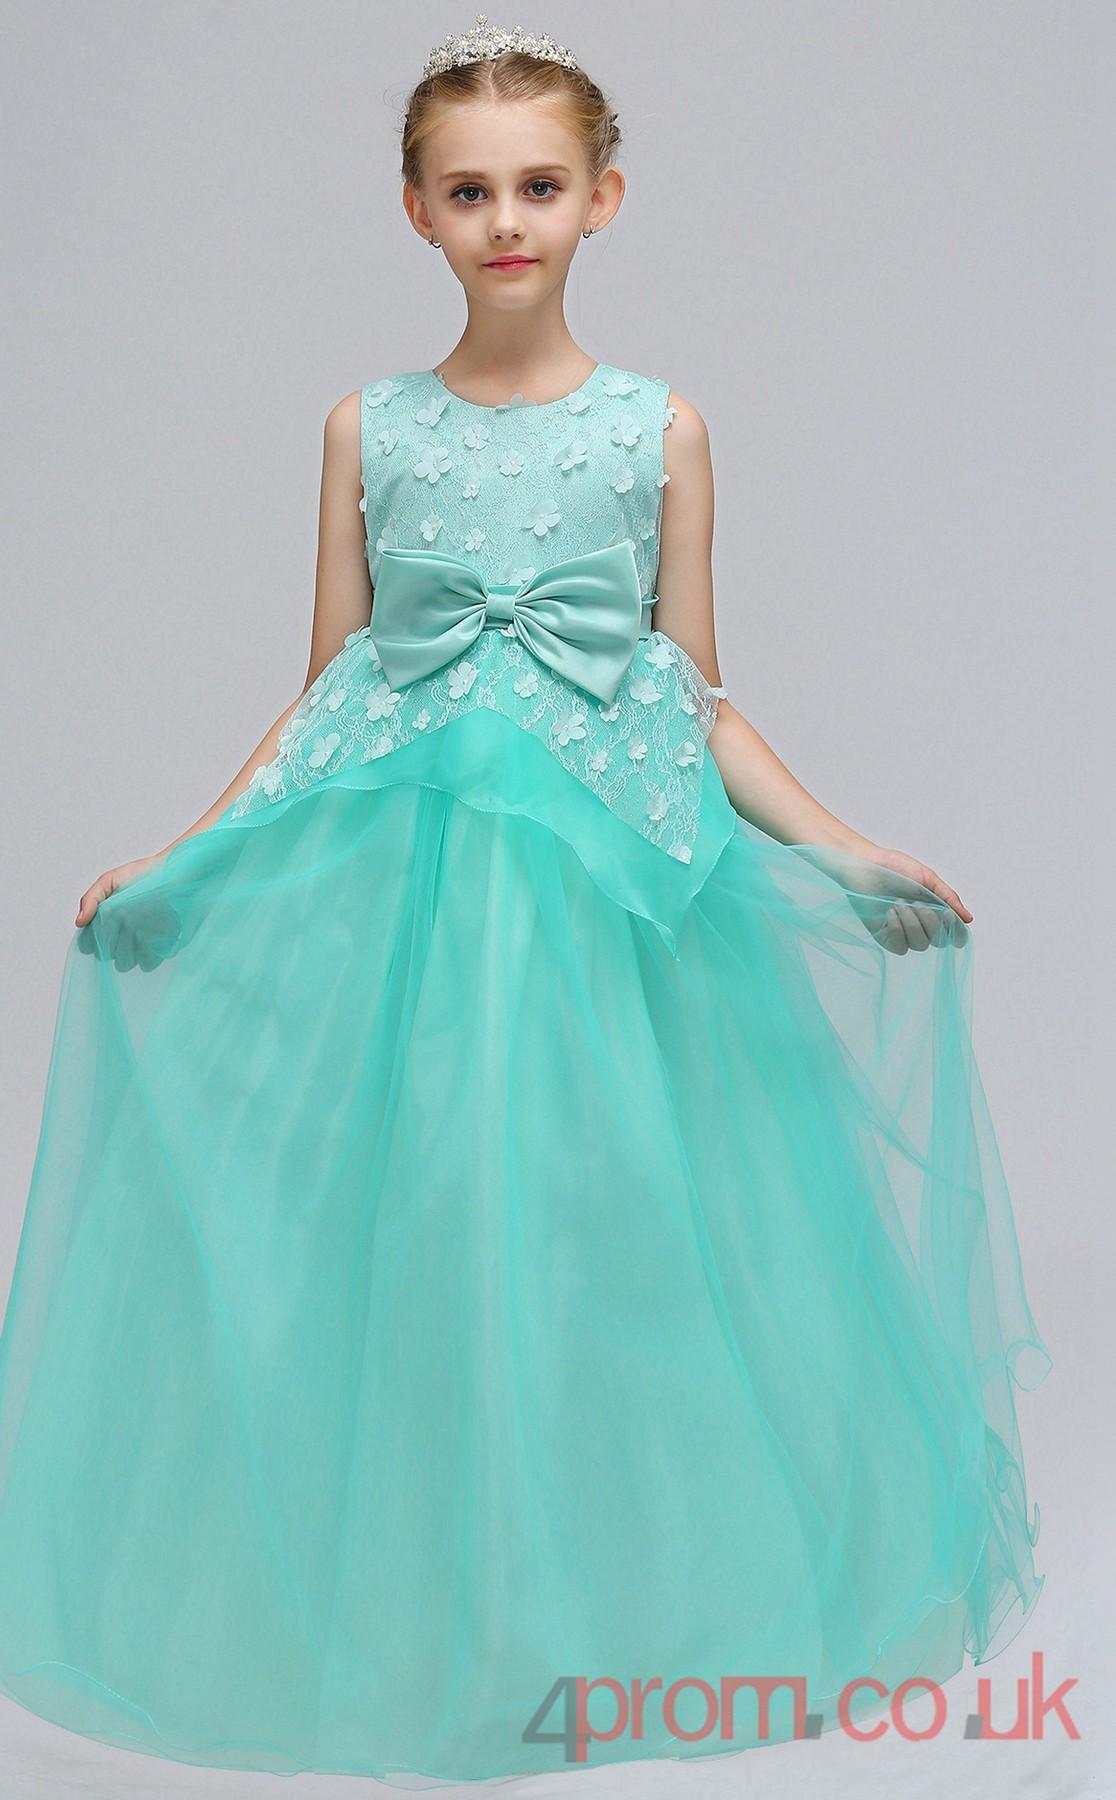 Attractive Kids Prom Dresses Uk Sketch - Wedding Dress - googeb.com